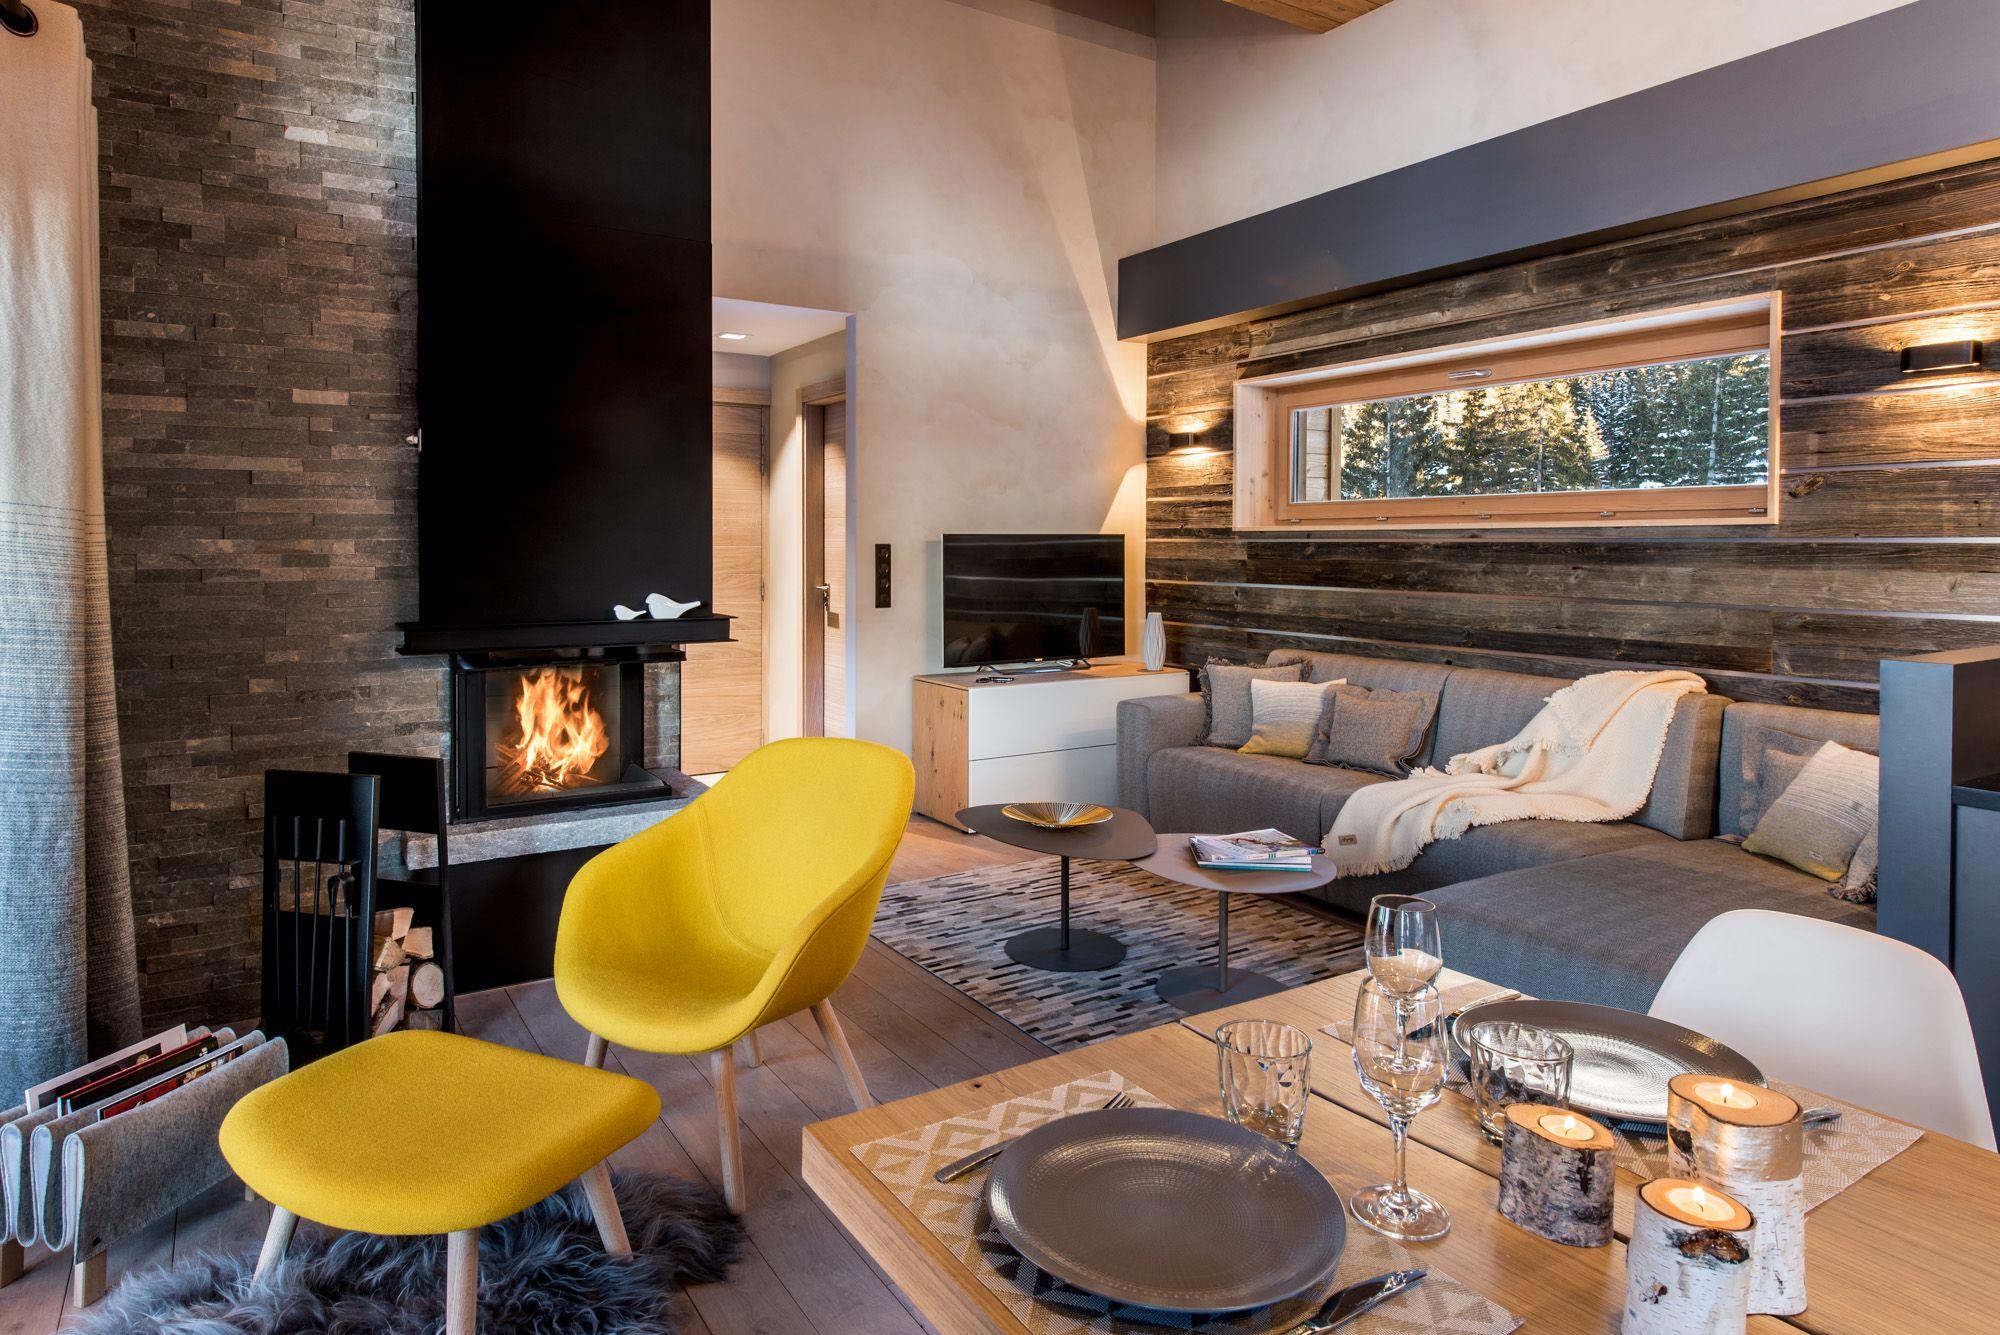 Agence Amevet Architectes D Interieur Chambery Savoie En 2020 Architecte Interieur Chambres Luxueuses Decoration Appartement